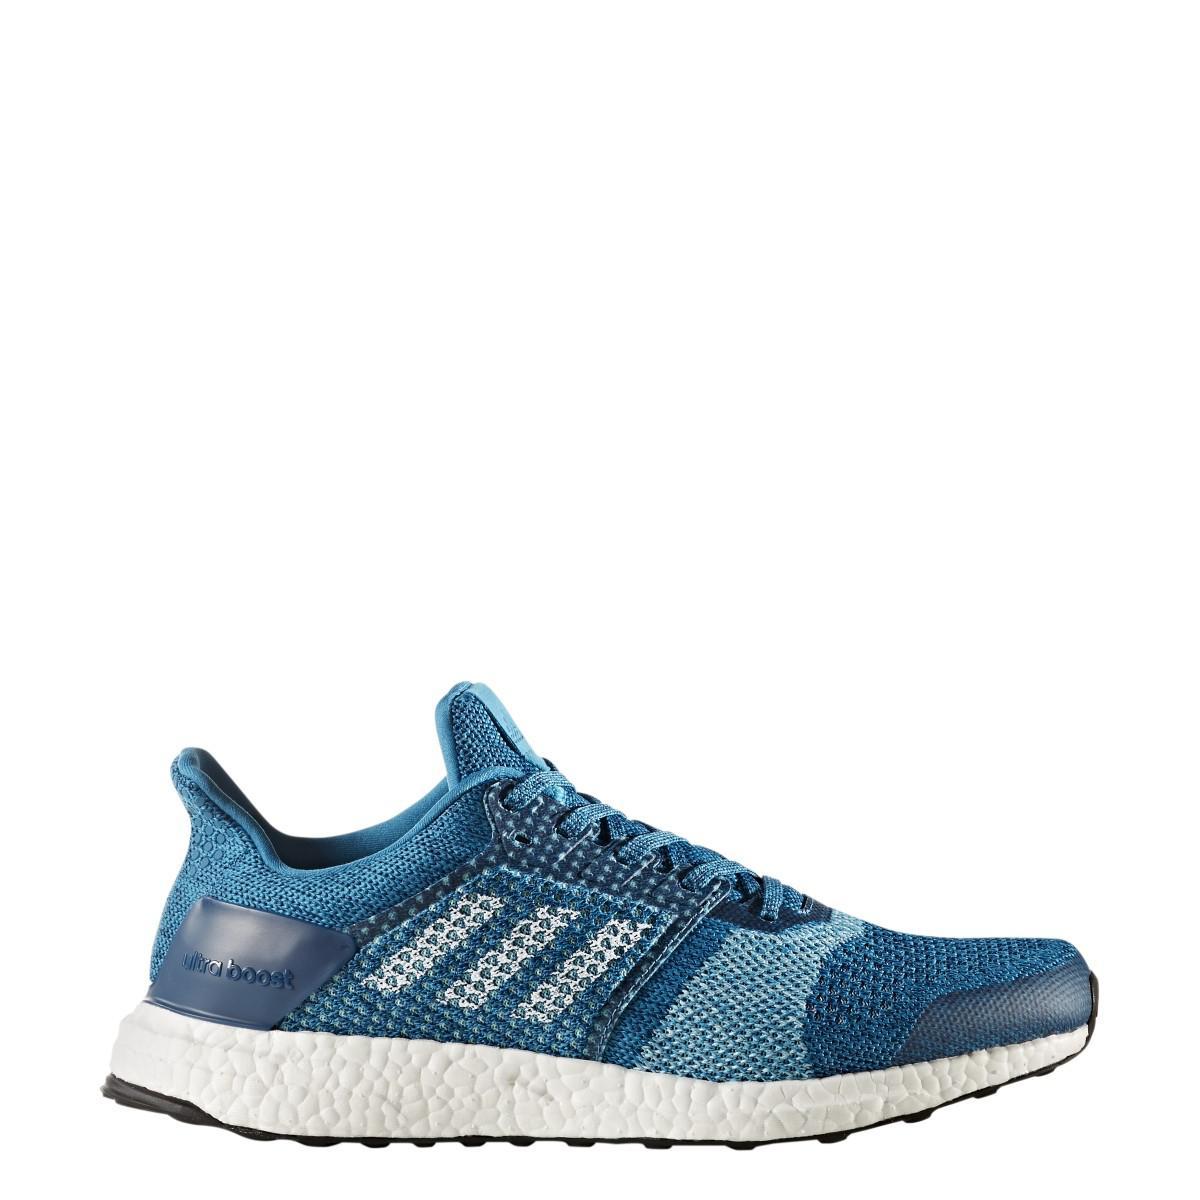 lyst adidas ultraboost st m in blau für männer